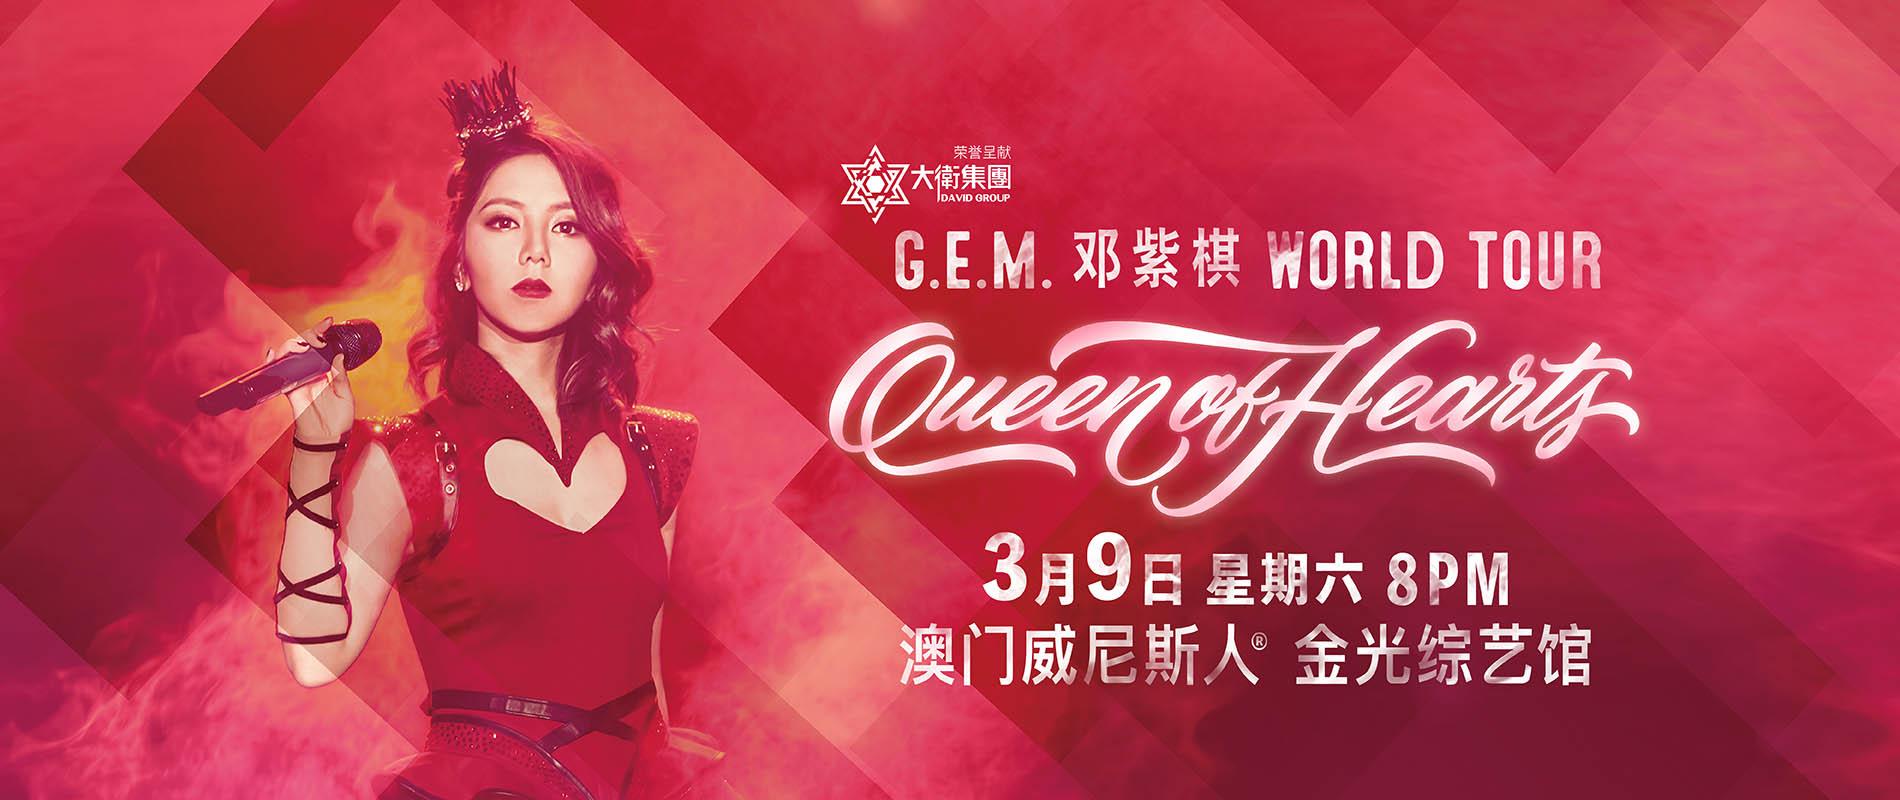 G.E.M. 邓紫棋QUEEN OF HEARTS 世界巡回演唱会 - 澳门威尼斯人金光综艺馆